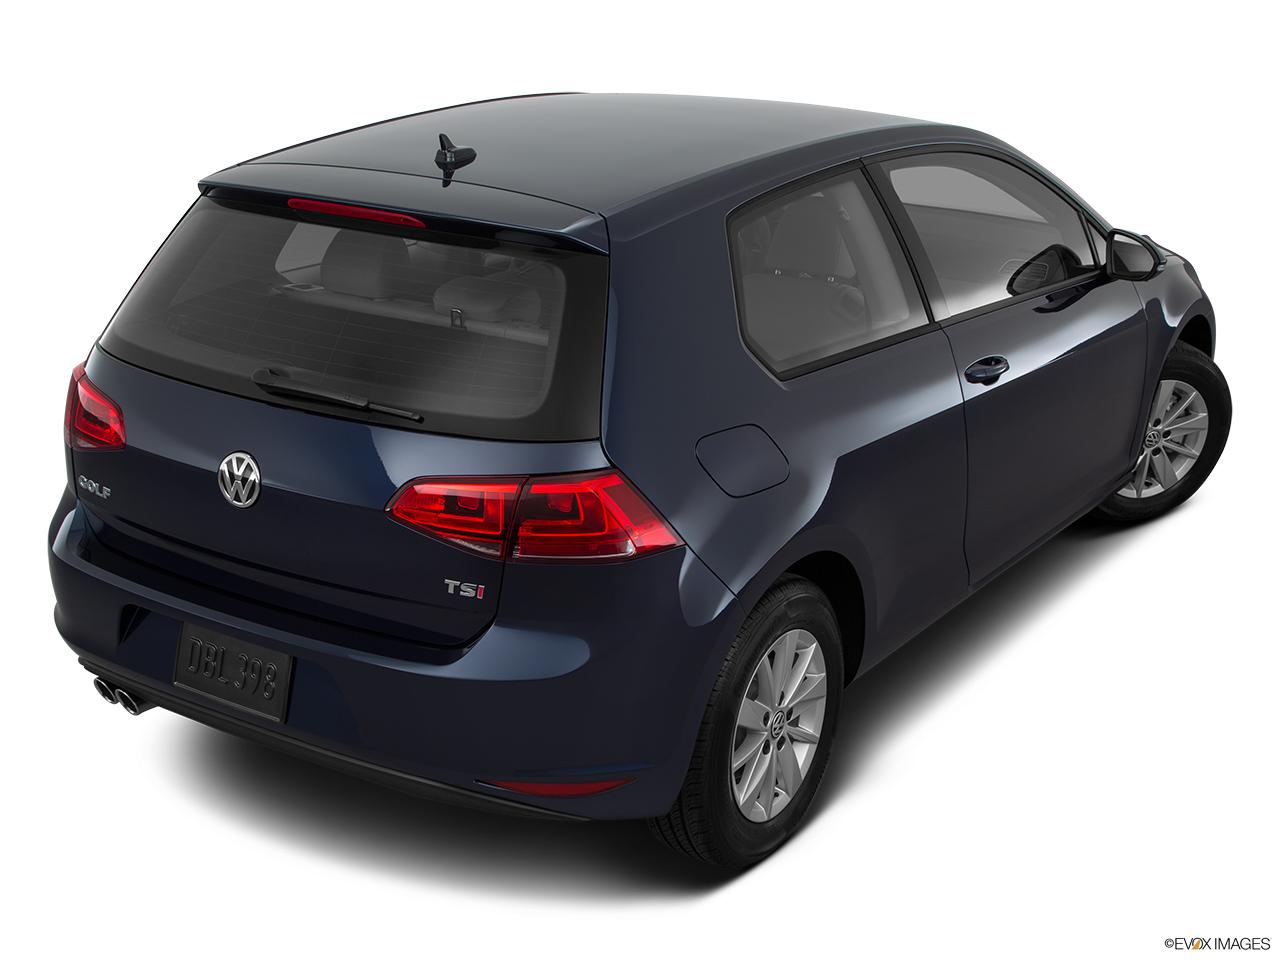 2015 Volkswagen Golf 2 Door Manual Launch Edition *Ltd Avail* Hatchback -  Rear 3